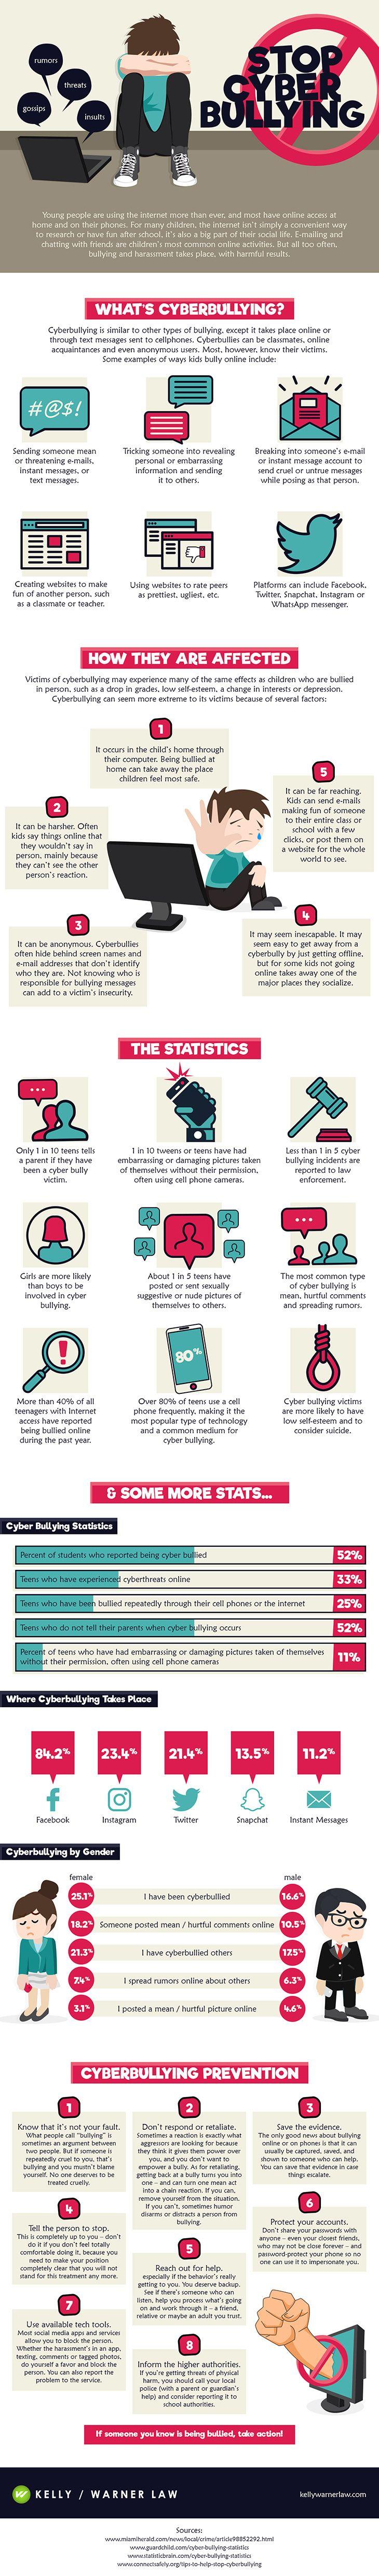 Cyberbulling: Statistics, And Practical Help